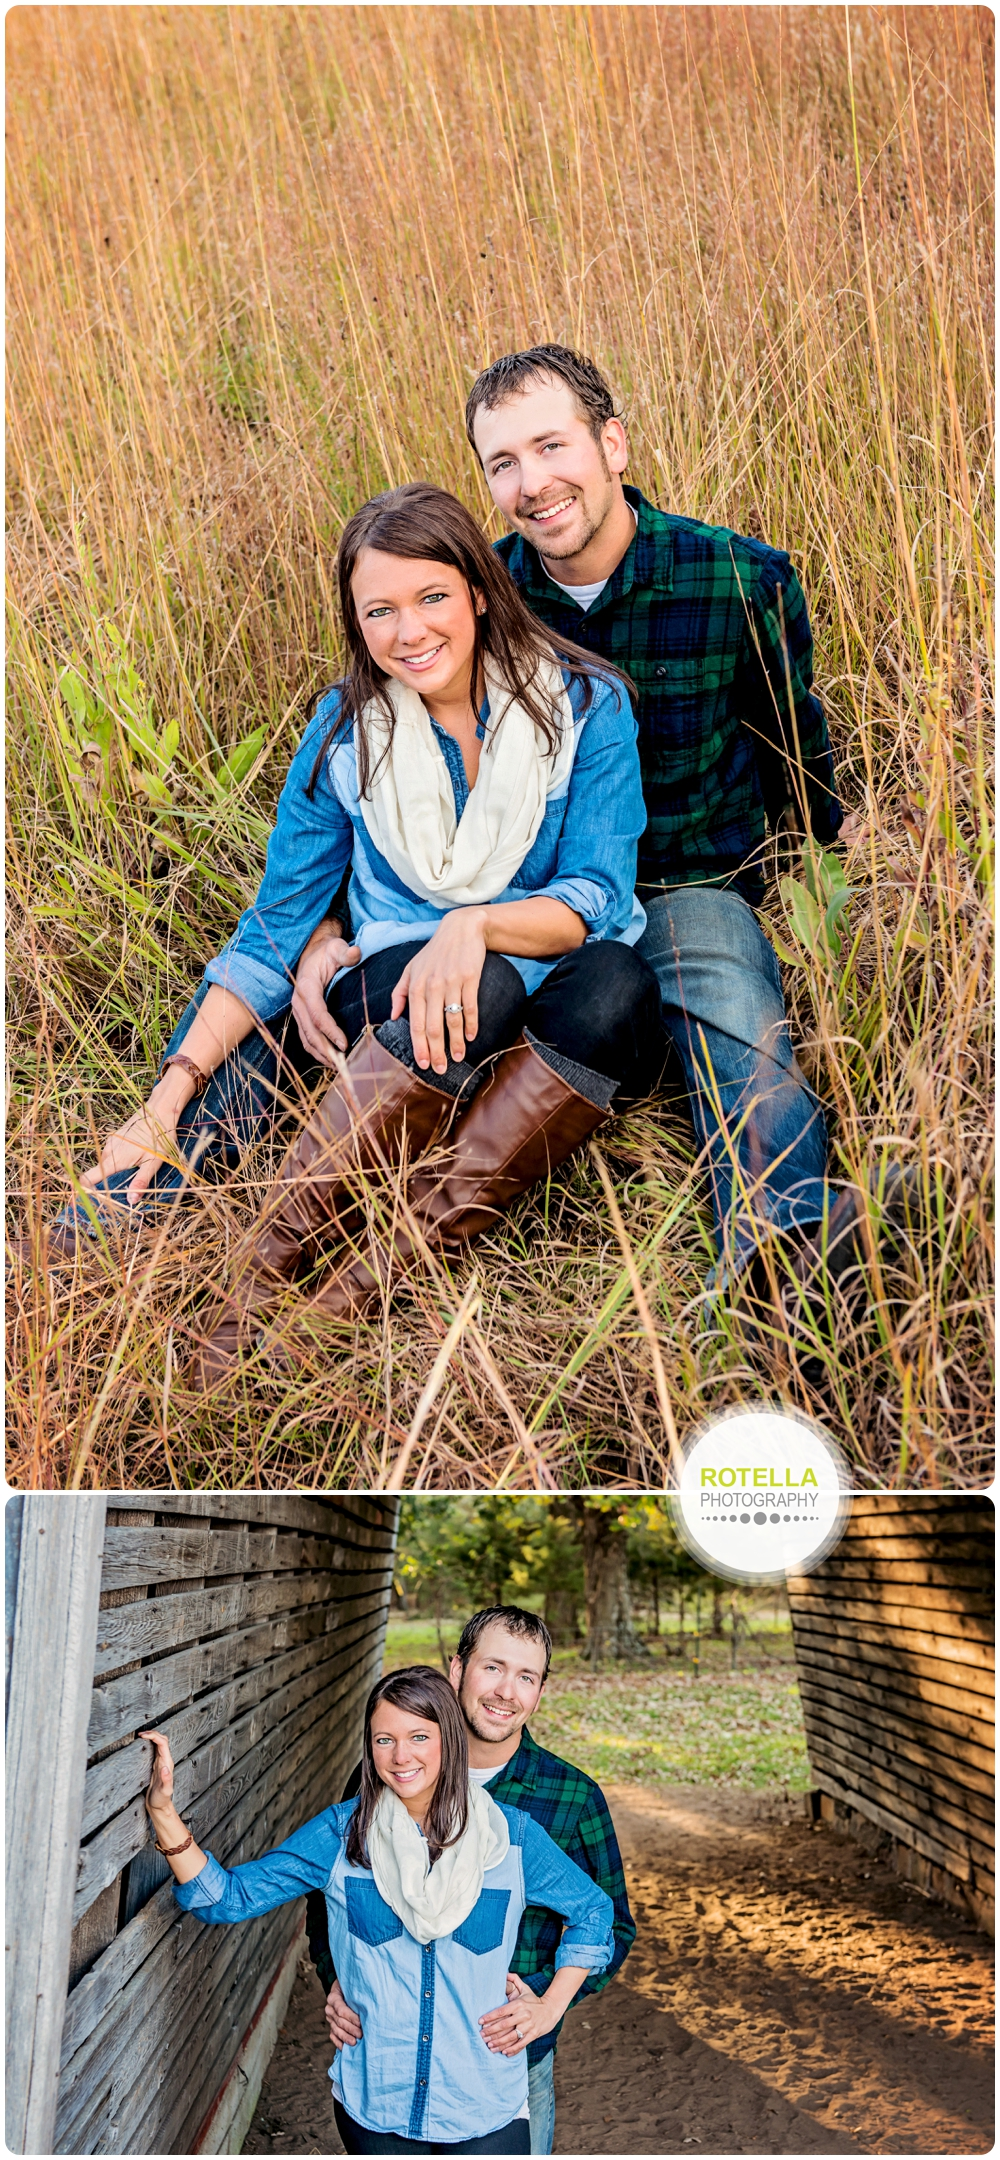 JON-LINDSEY-MINNESOTA-WEDDING-PHOTOGRAPHY-ROTELLA-PHOTOGRAPHY_2015-02